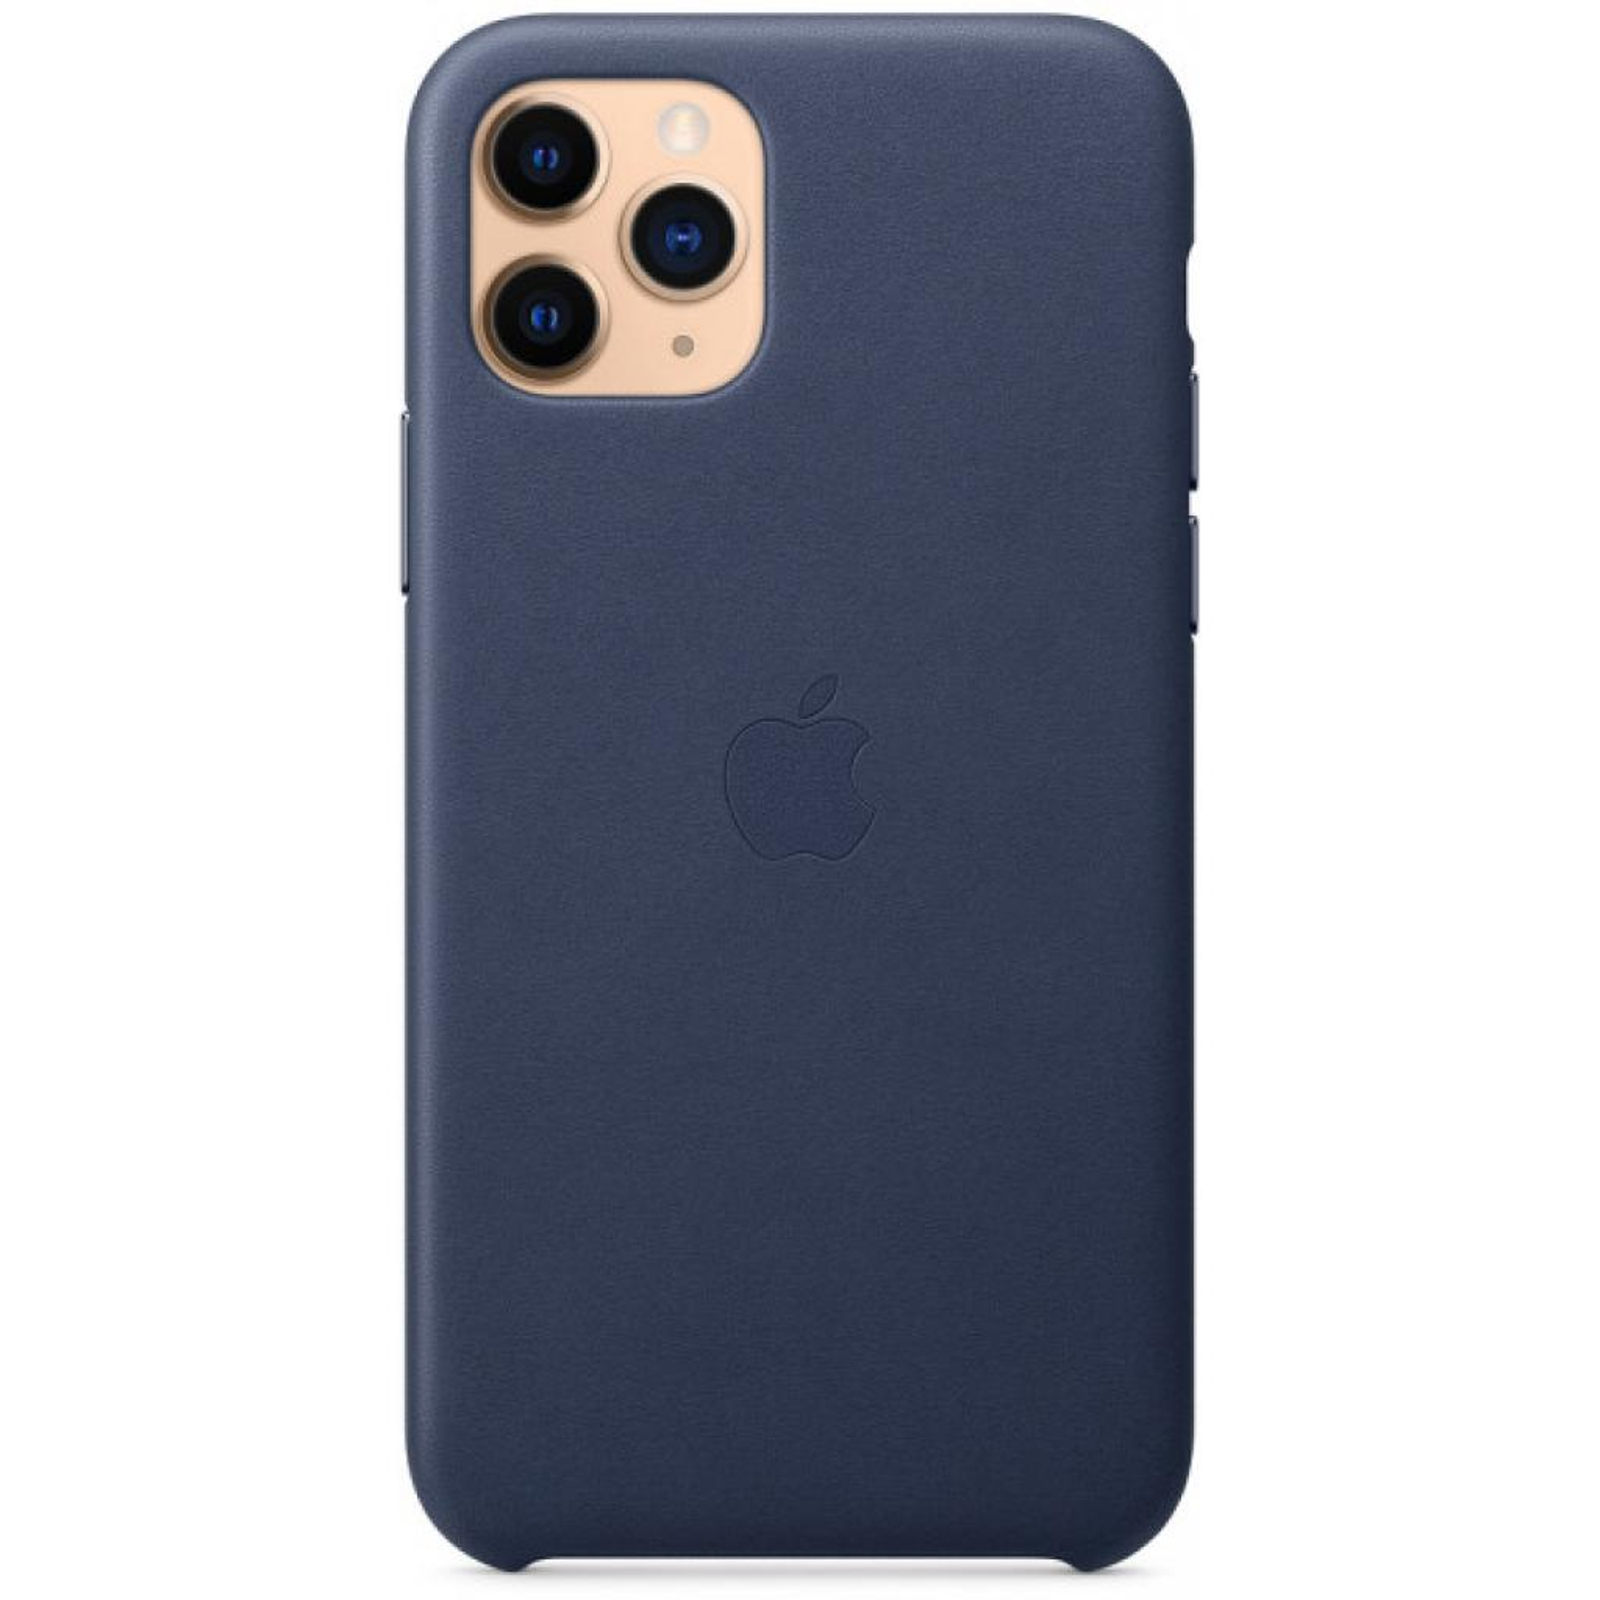 Чехол для моб. телефона Apple iPhone 11 Pro Leather Case - Midnight Blue (MWYG2ZM/A) изображение 4